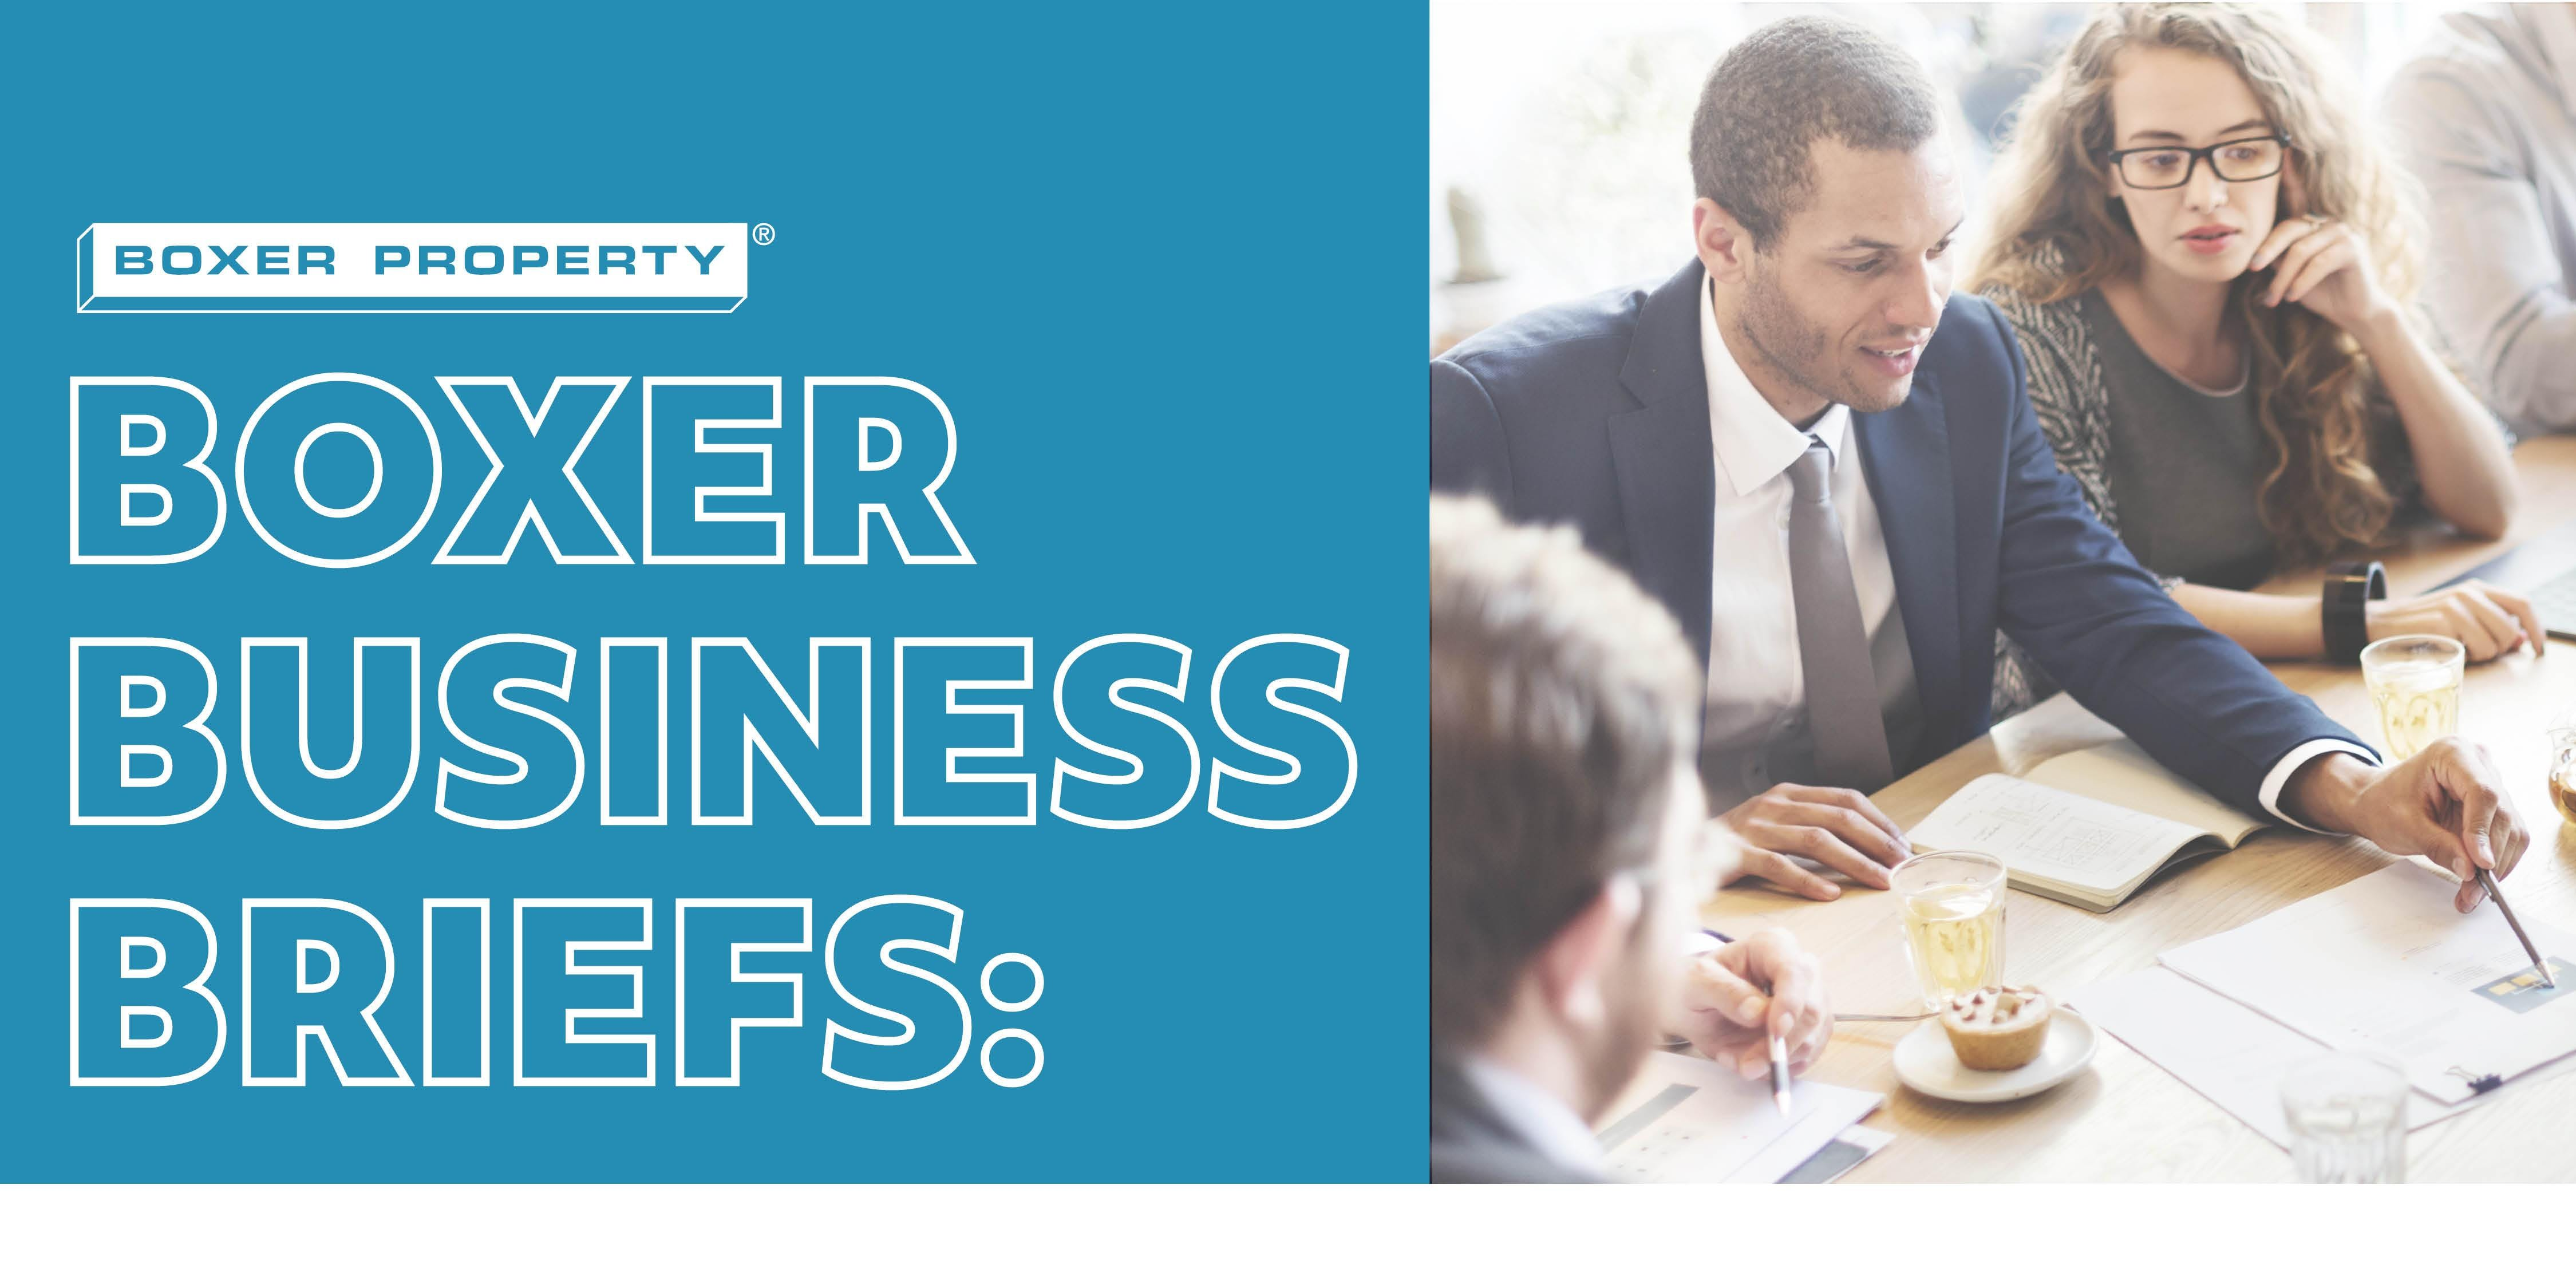 Boxer Business Briefs: Digital Marketing Strategies